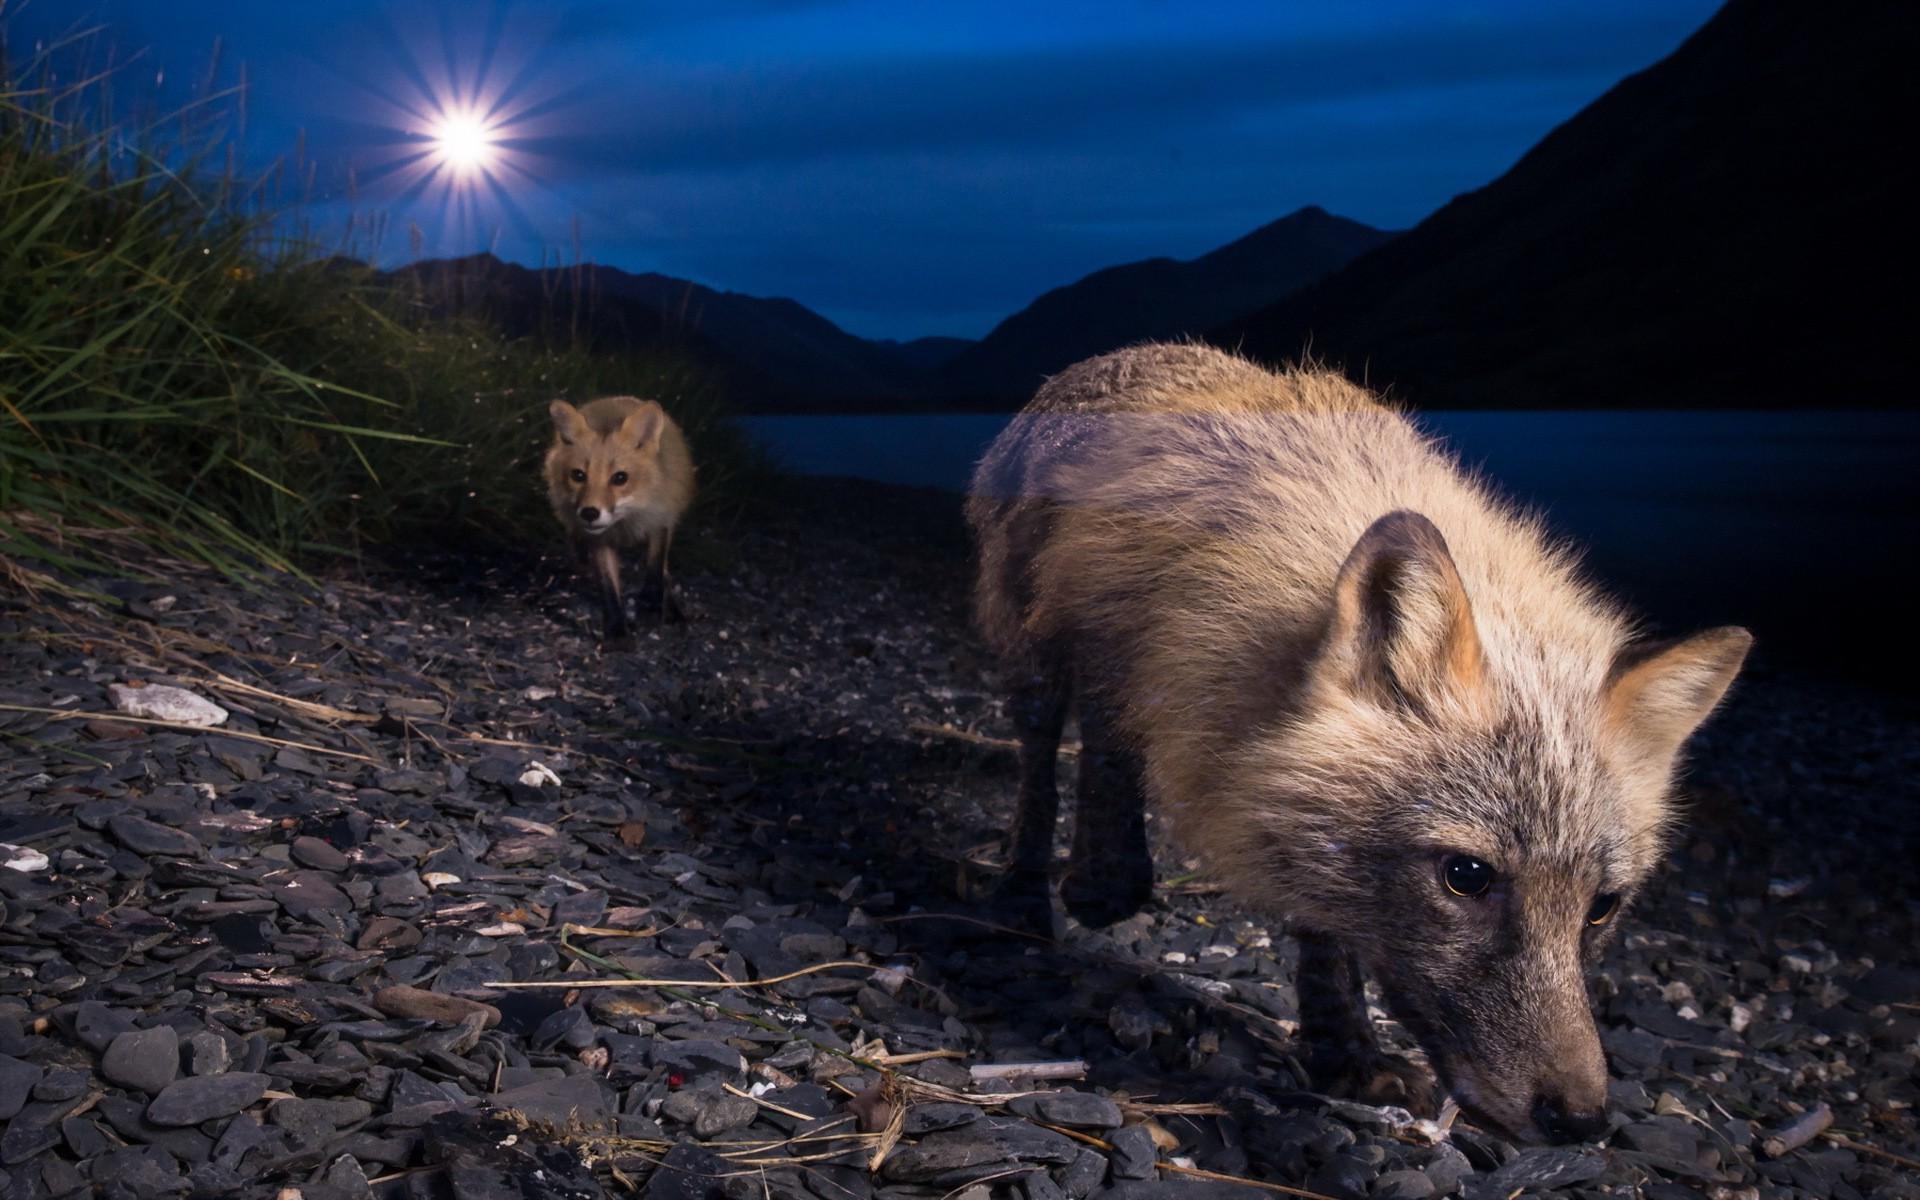 Cool Wallpaper Animal Night - animals-night-wildlife-fox-pig-fauna-mammal-1920x1200-px-vertebrate-pig-like-mammal-wild-boar-527098  Snapshot_7649      .jpg